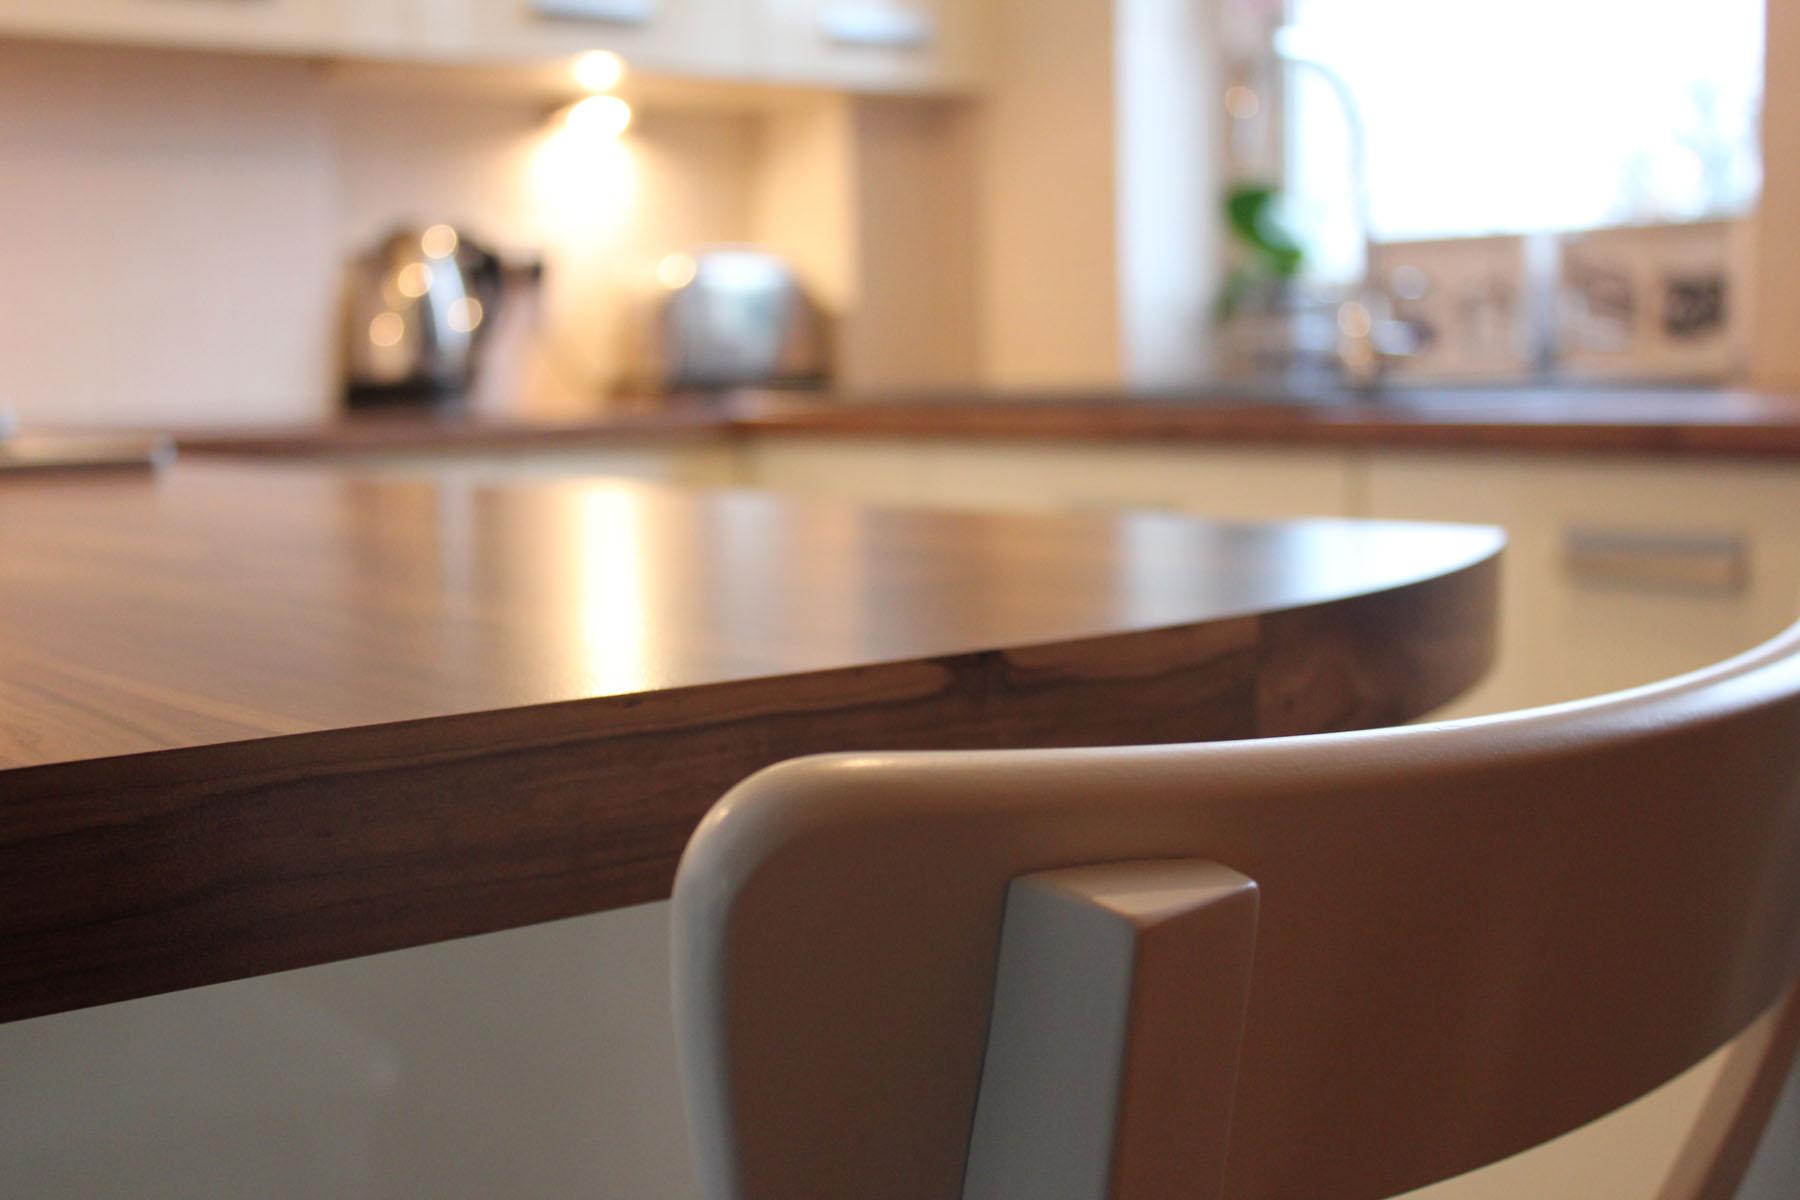 Wood effect laminate worktops